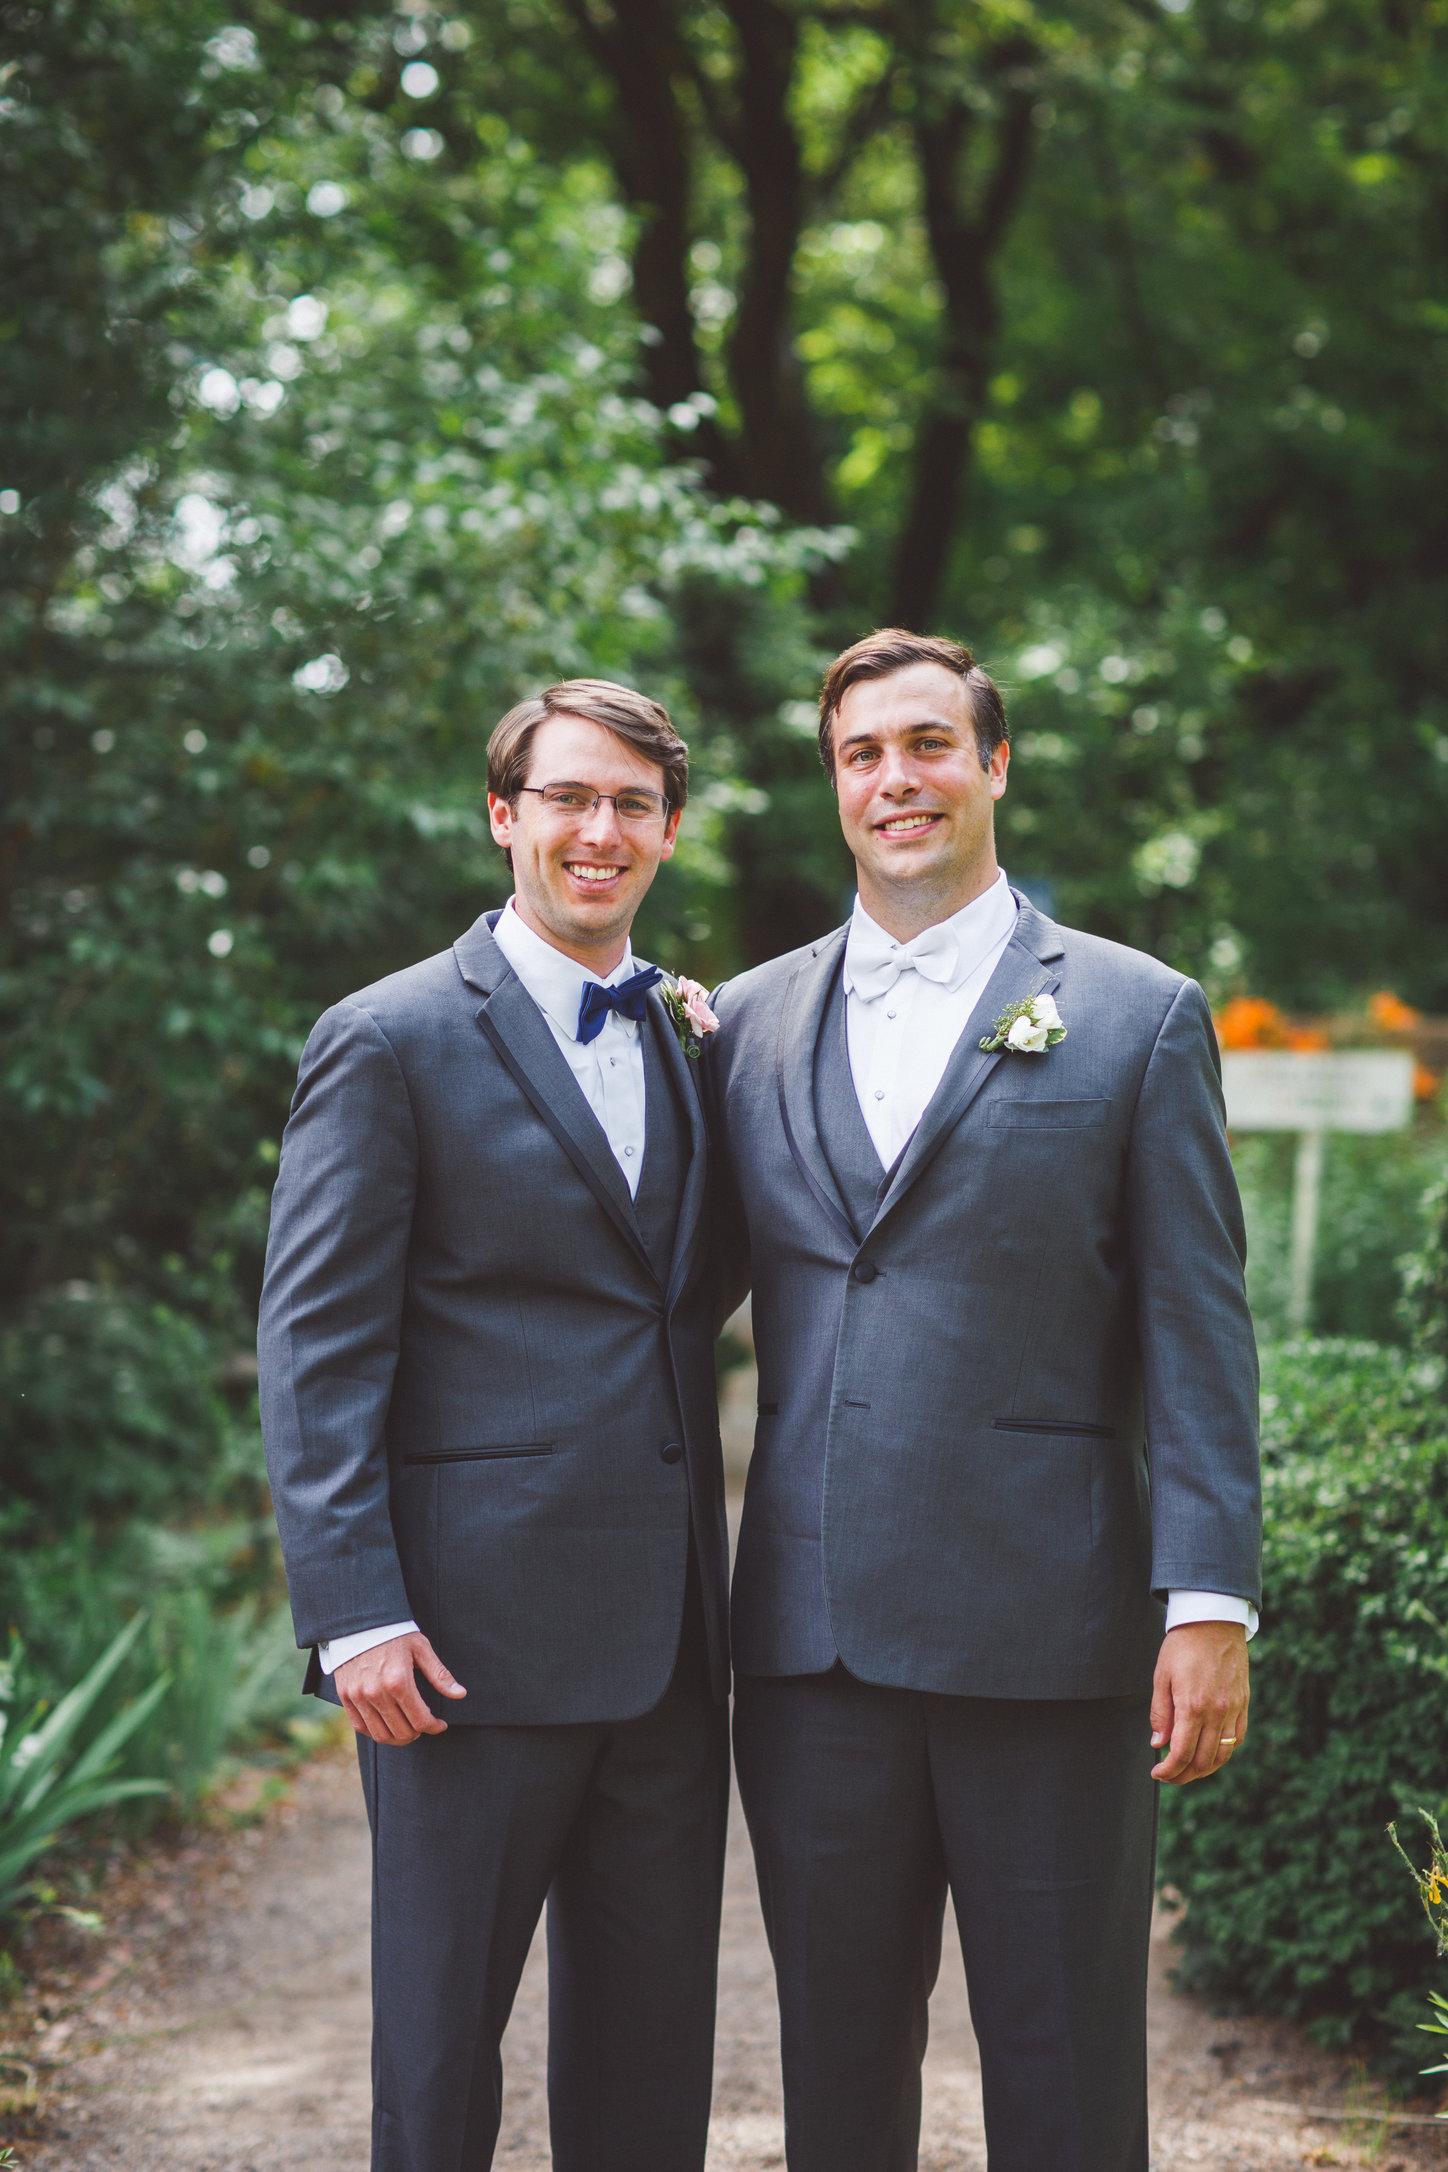 SandC-wedding-354.jpg